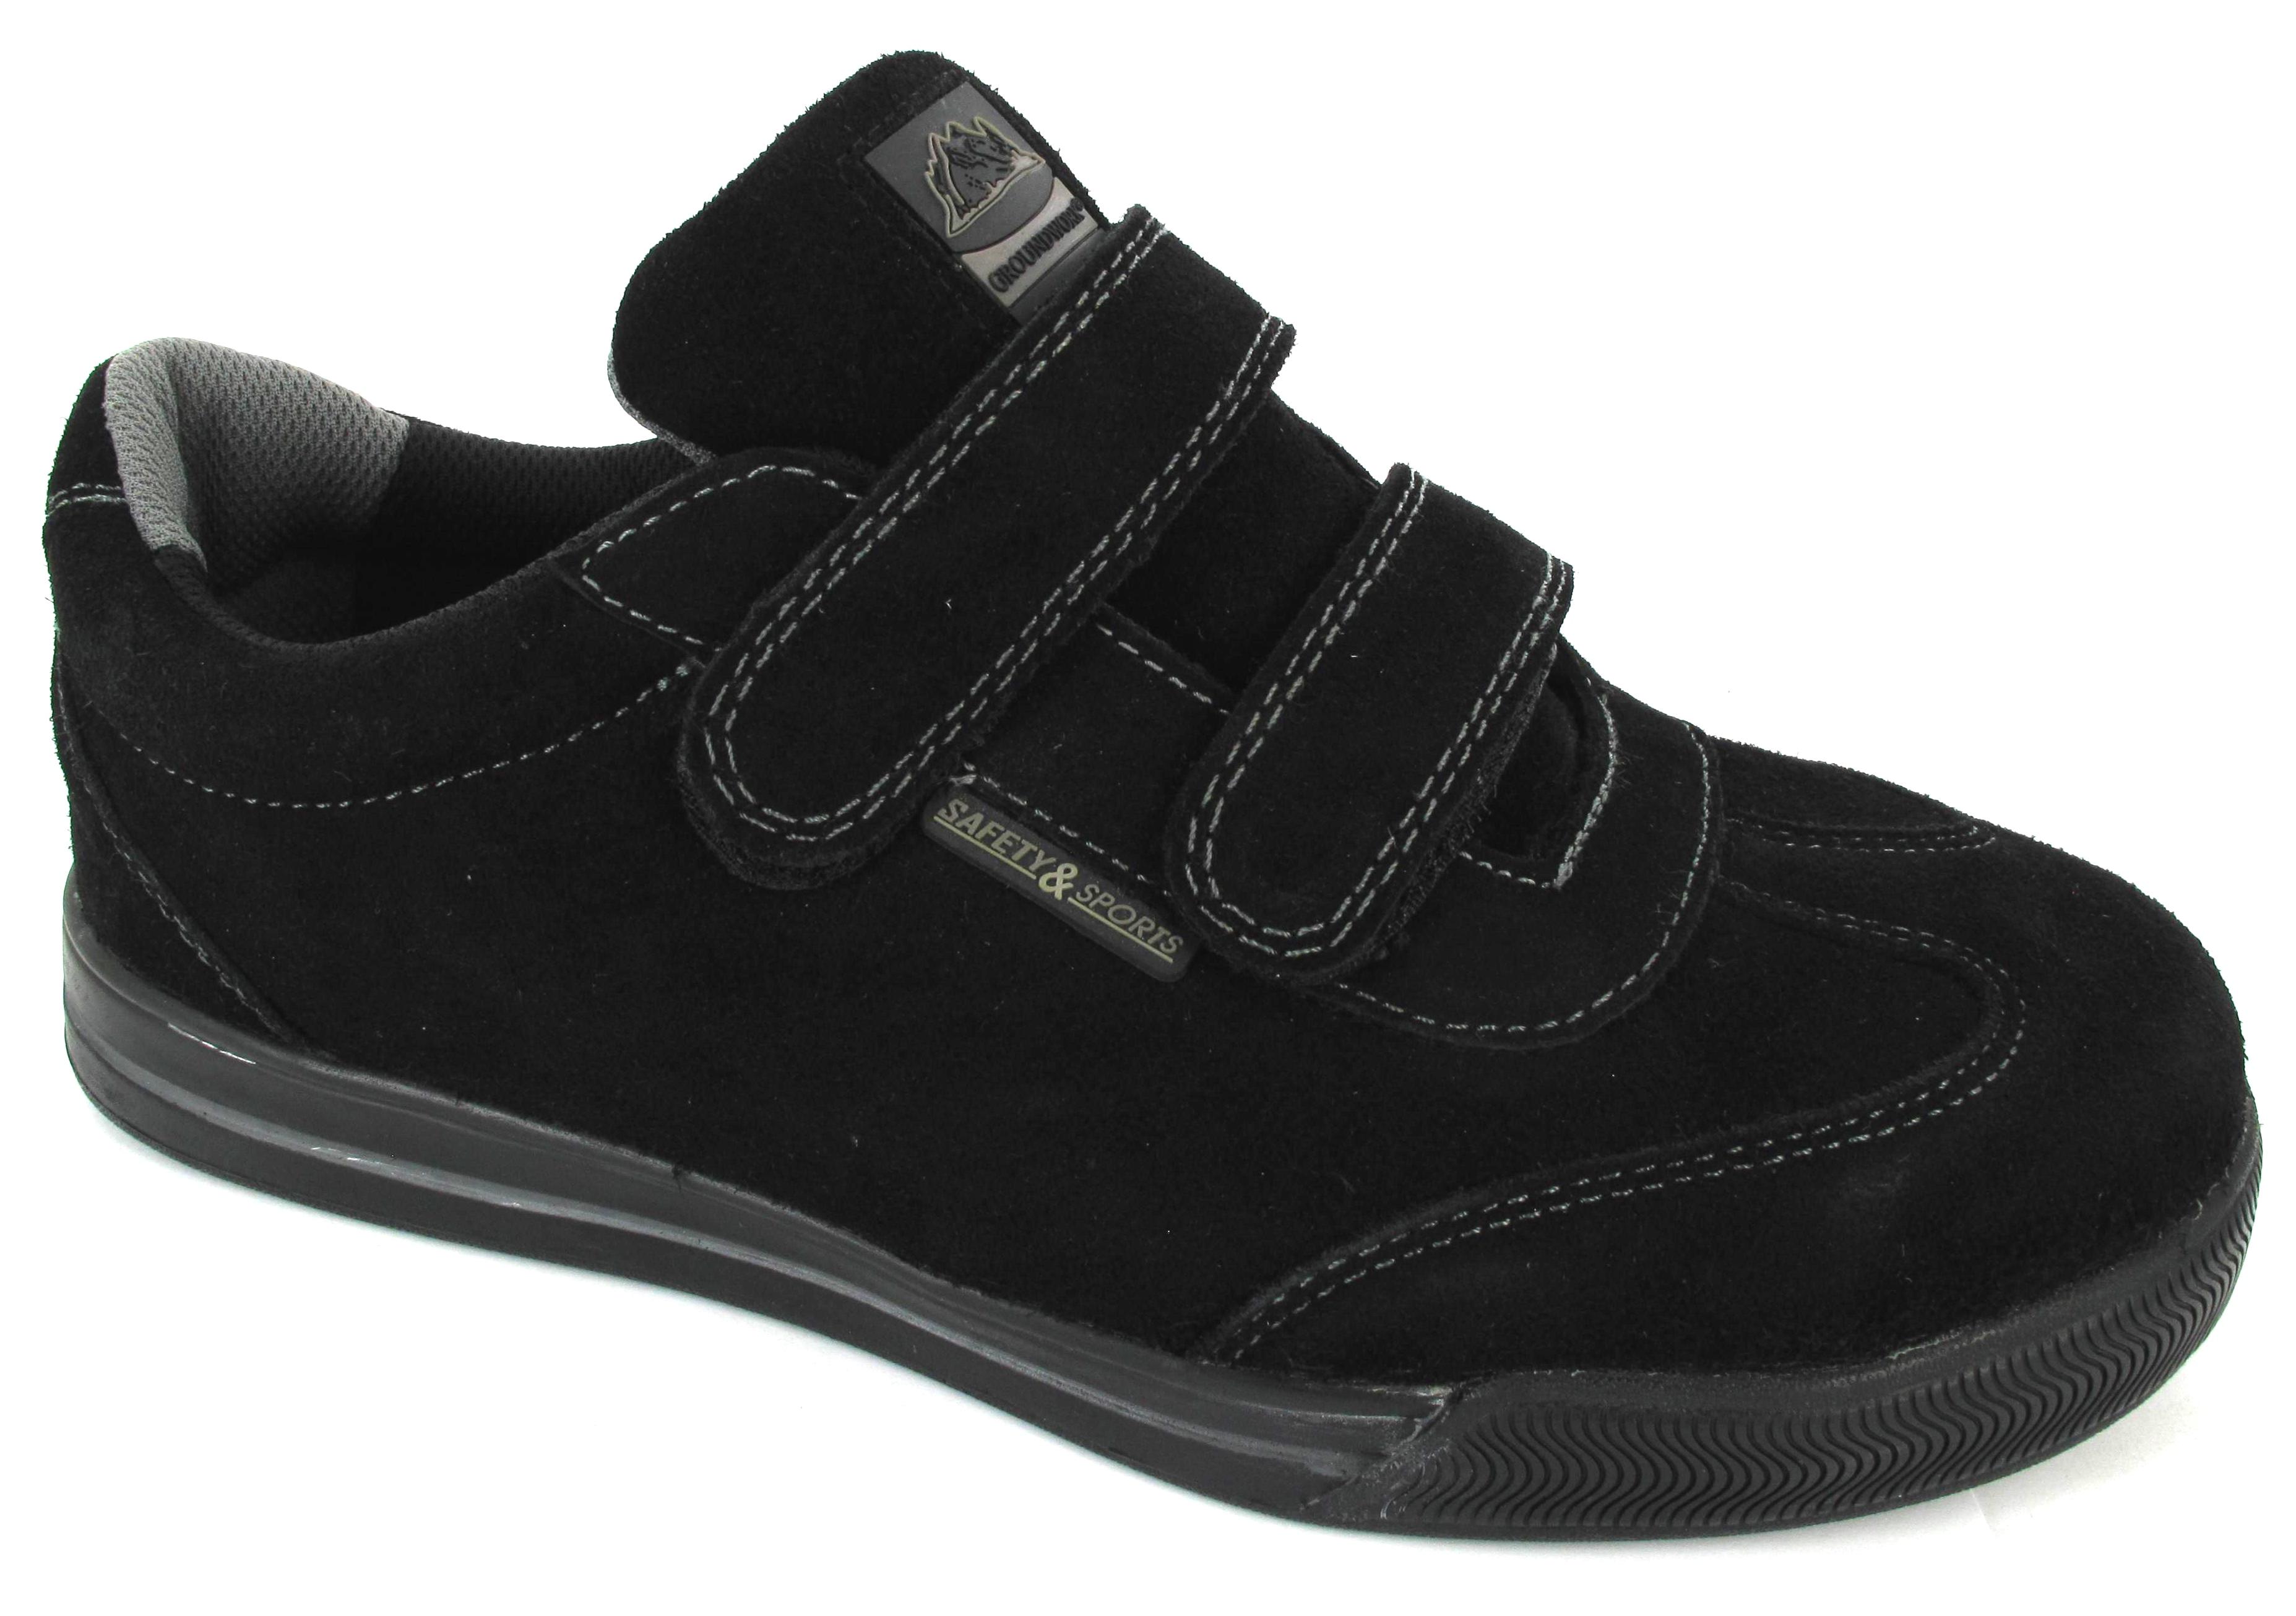 mens steel toe cap safety velcro work leather lightweight. Black Bedroom Furniture Sets. Home Design Ideas